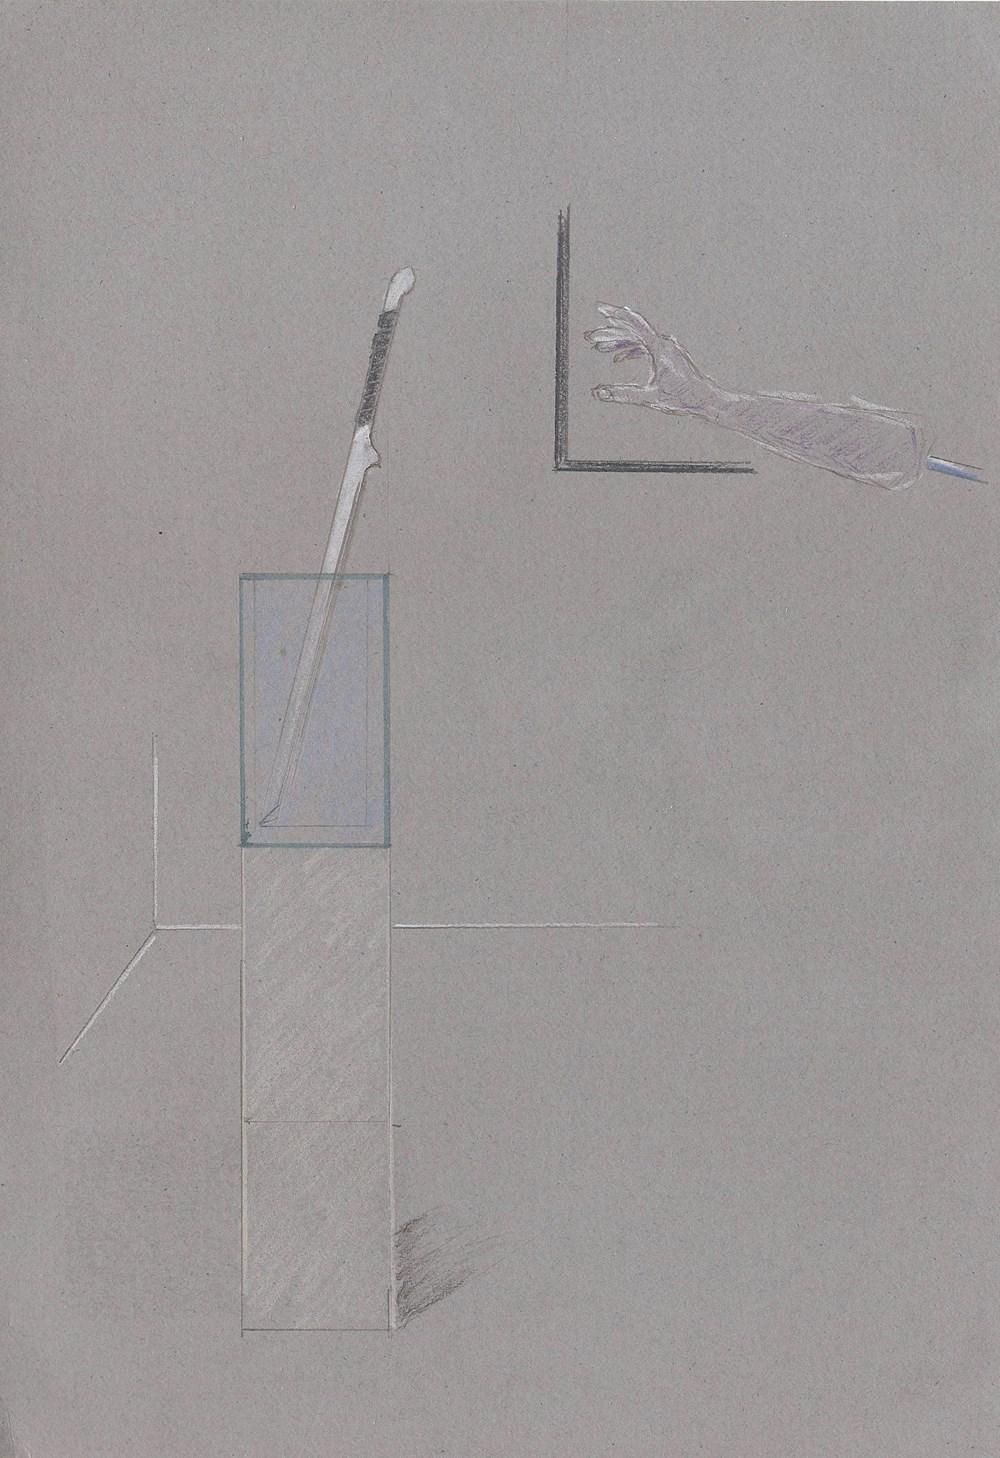 Studio Sale | Alexander Glass - Lot 22, Alexander Glass, Another Sword